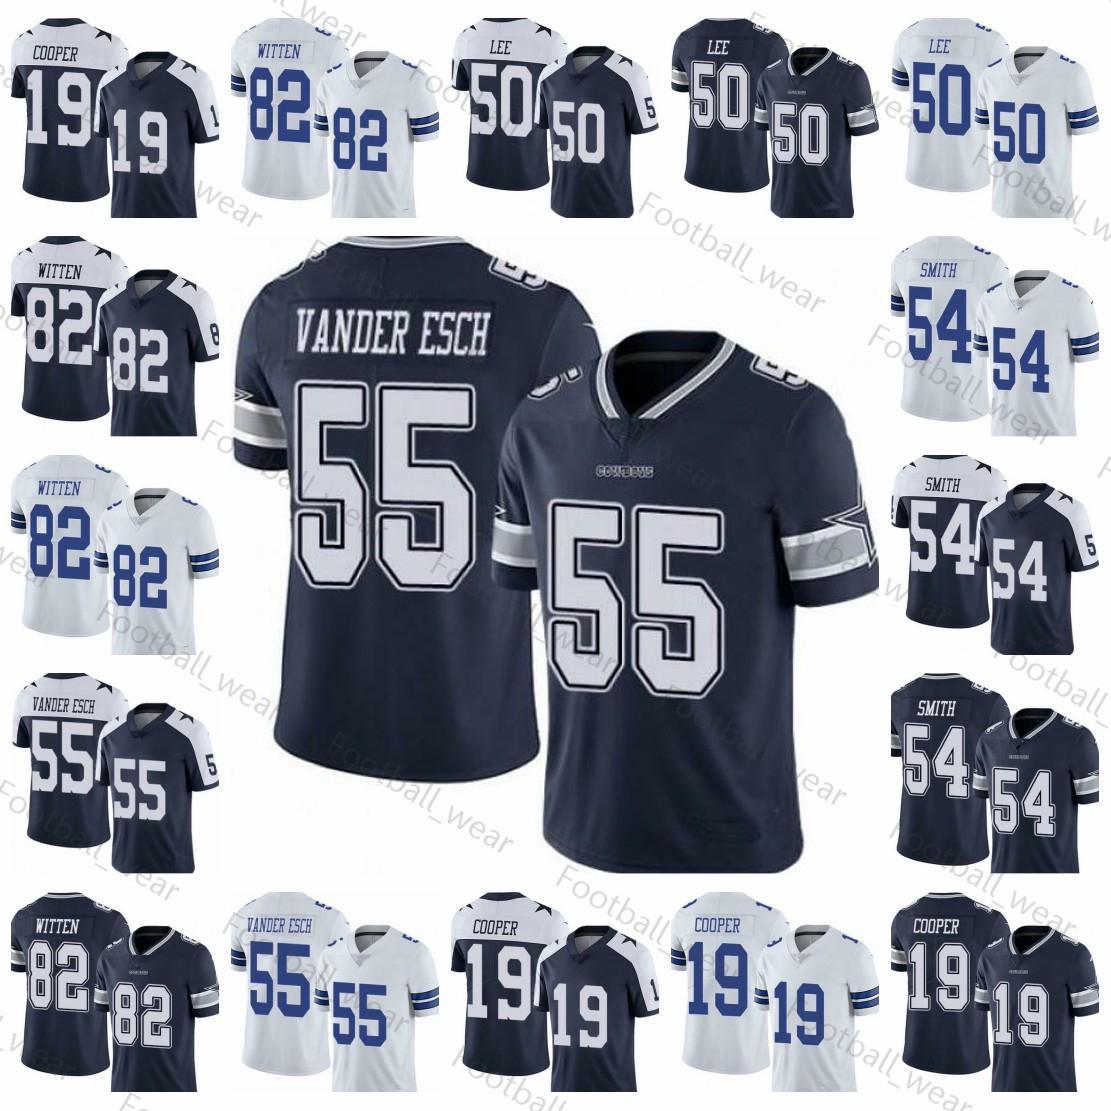 new concept a655a 892d2 Men s Youth Dallas 54 Jaylon Smith Cowboys Jersey Jason Witten Leighton  Vander Esch Women Sean Lee Amari Cooper %Tue Football Jerseys